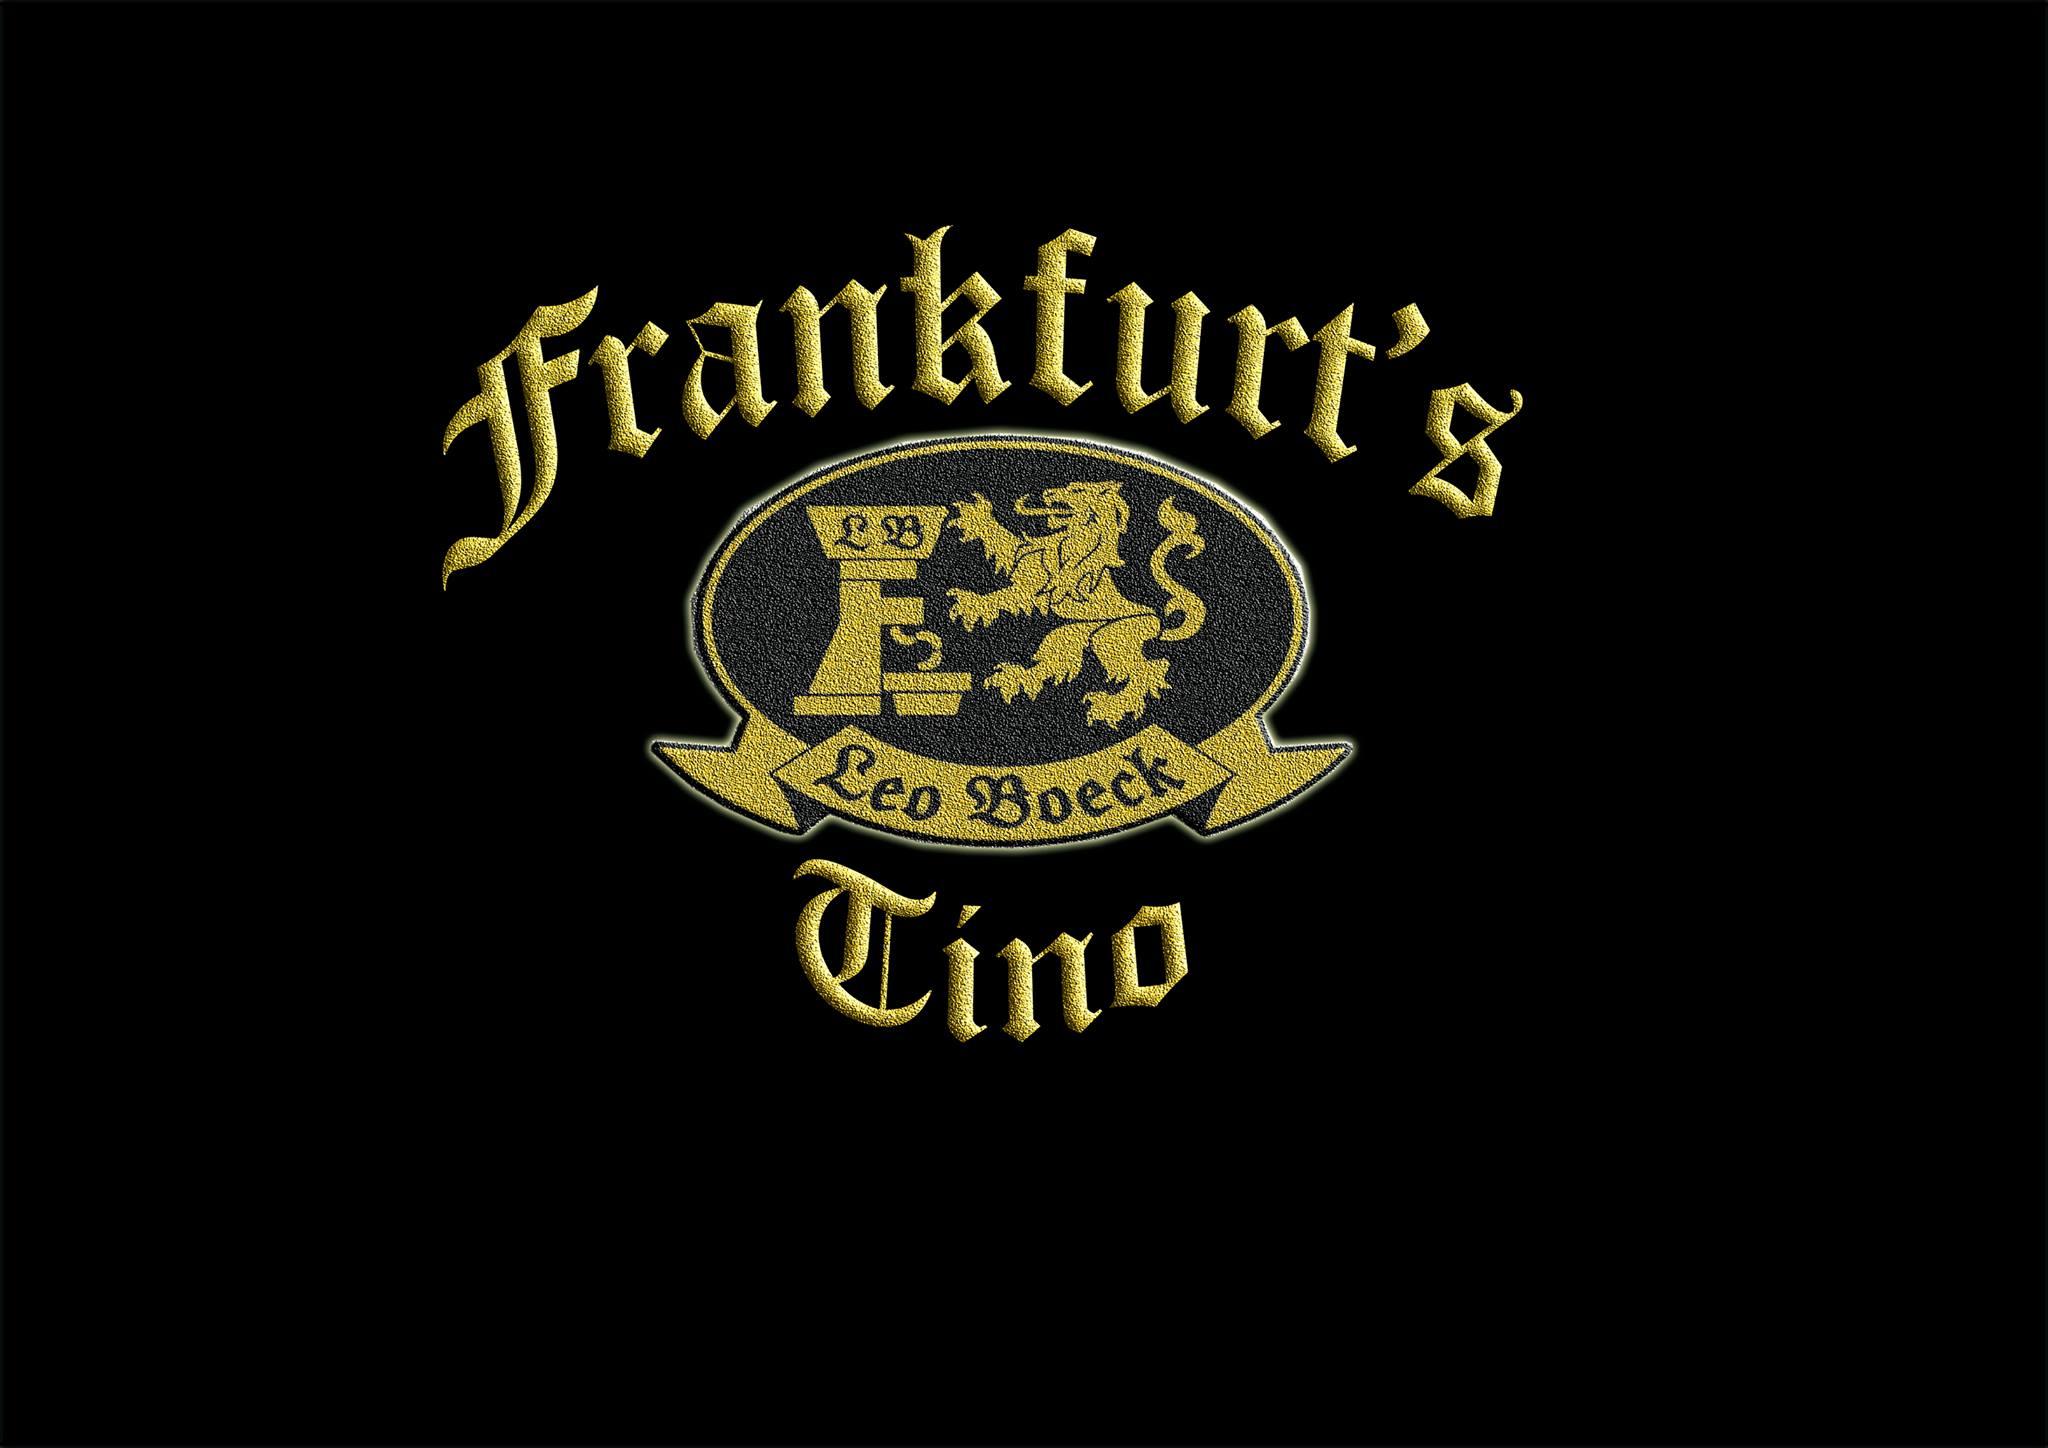 Frankfurt Tino